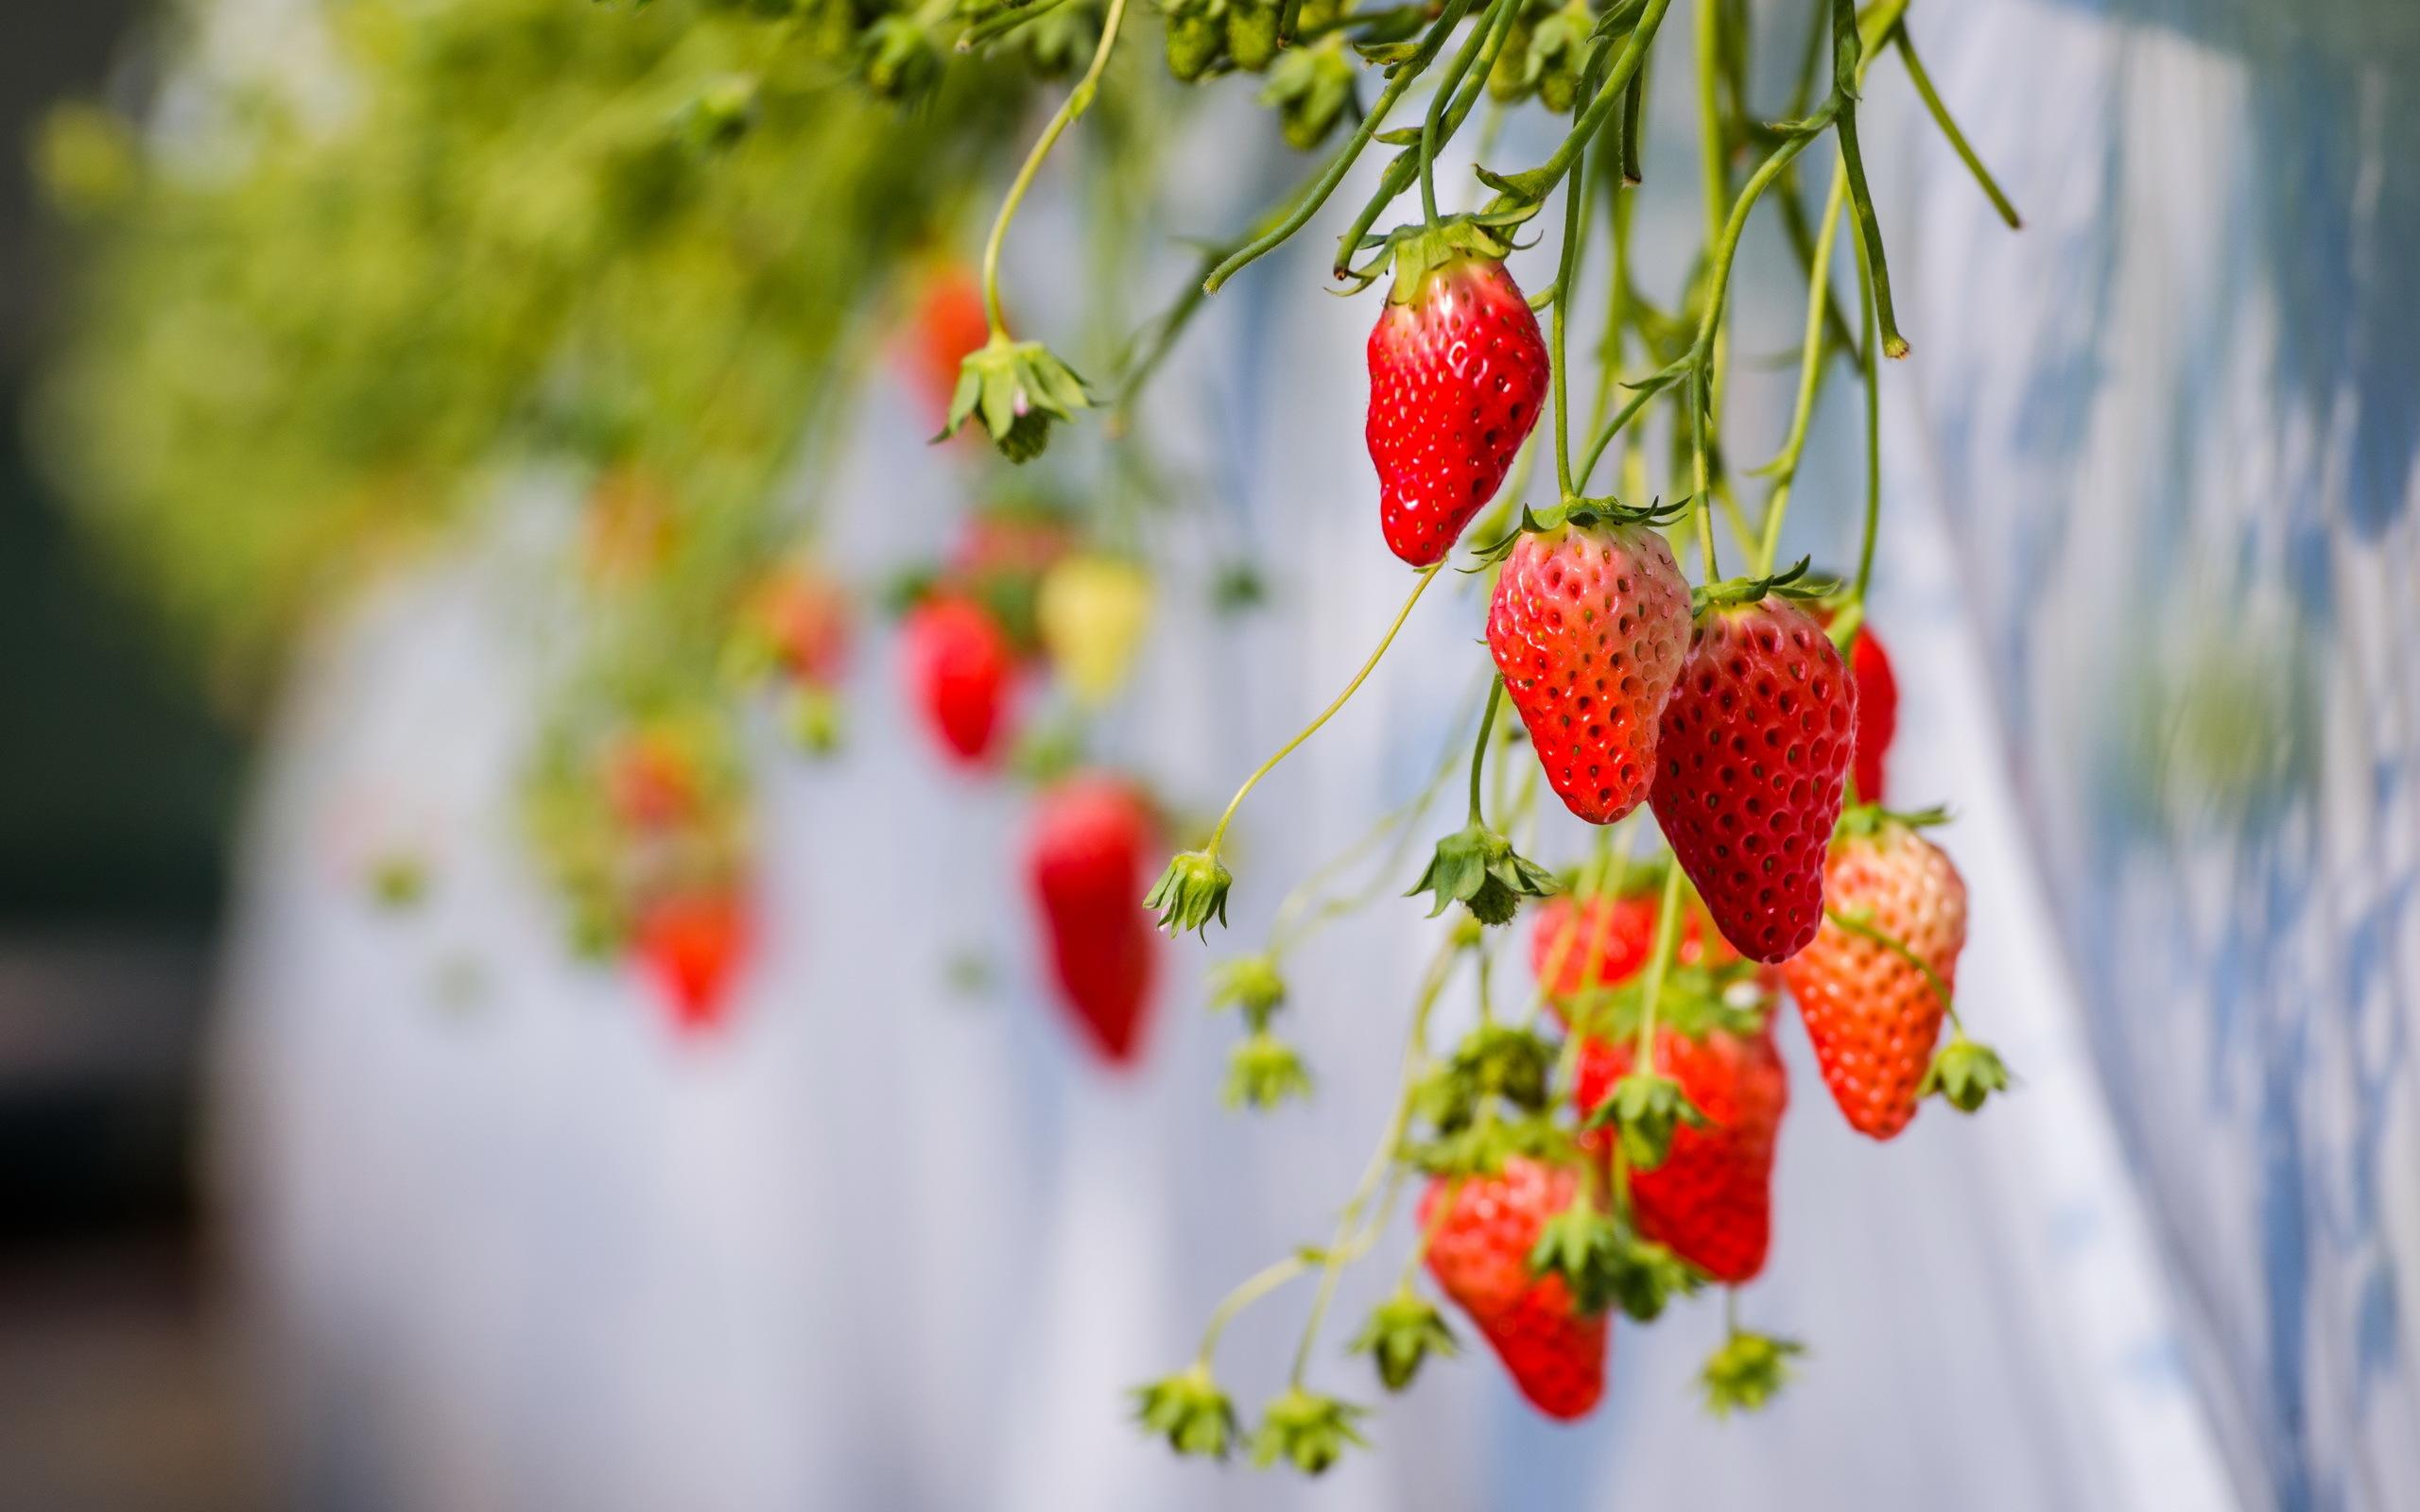 Strawberries Hanging Hd Wallpaper